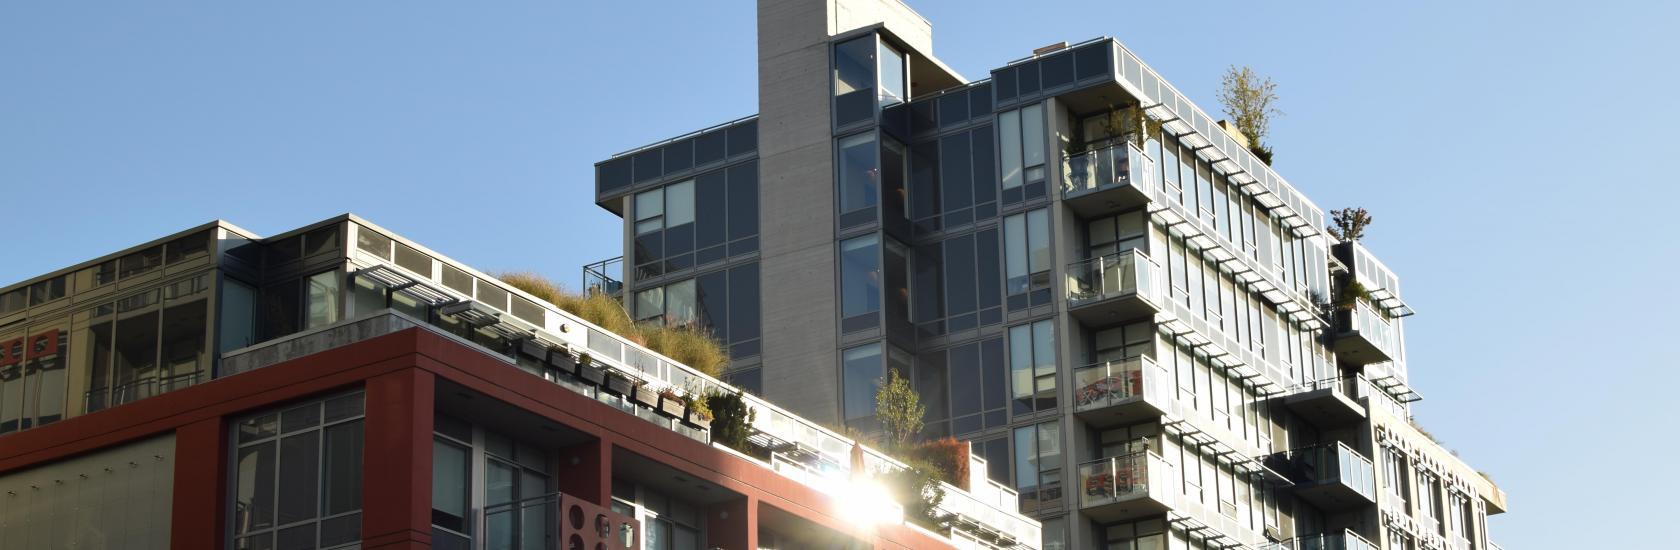 111 E 1st Avenue, Olympic Village, Vancouver West 2